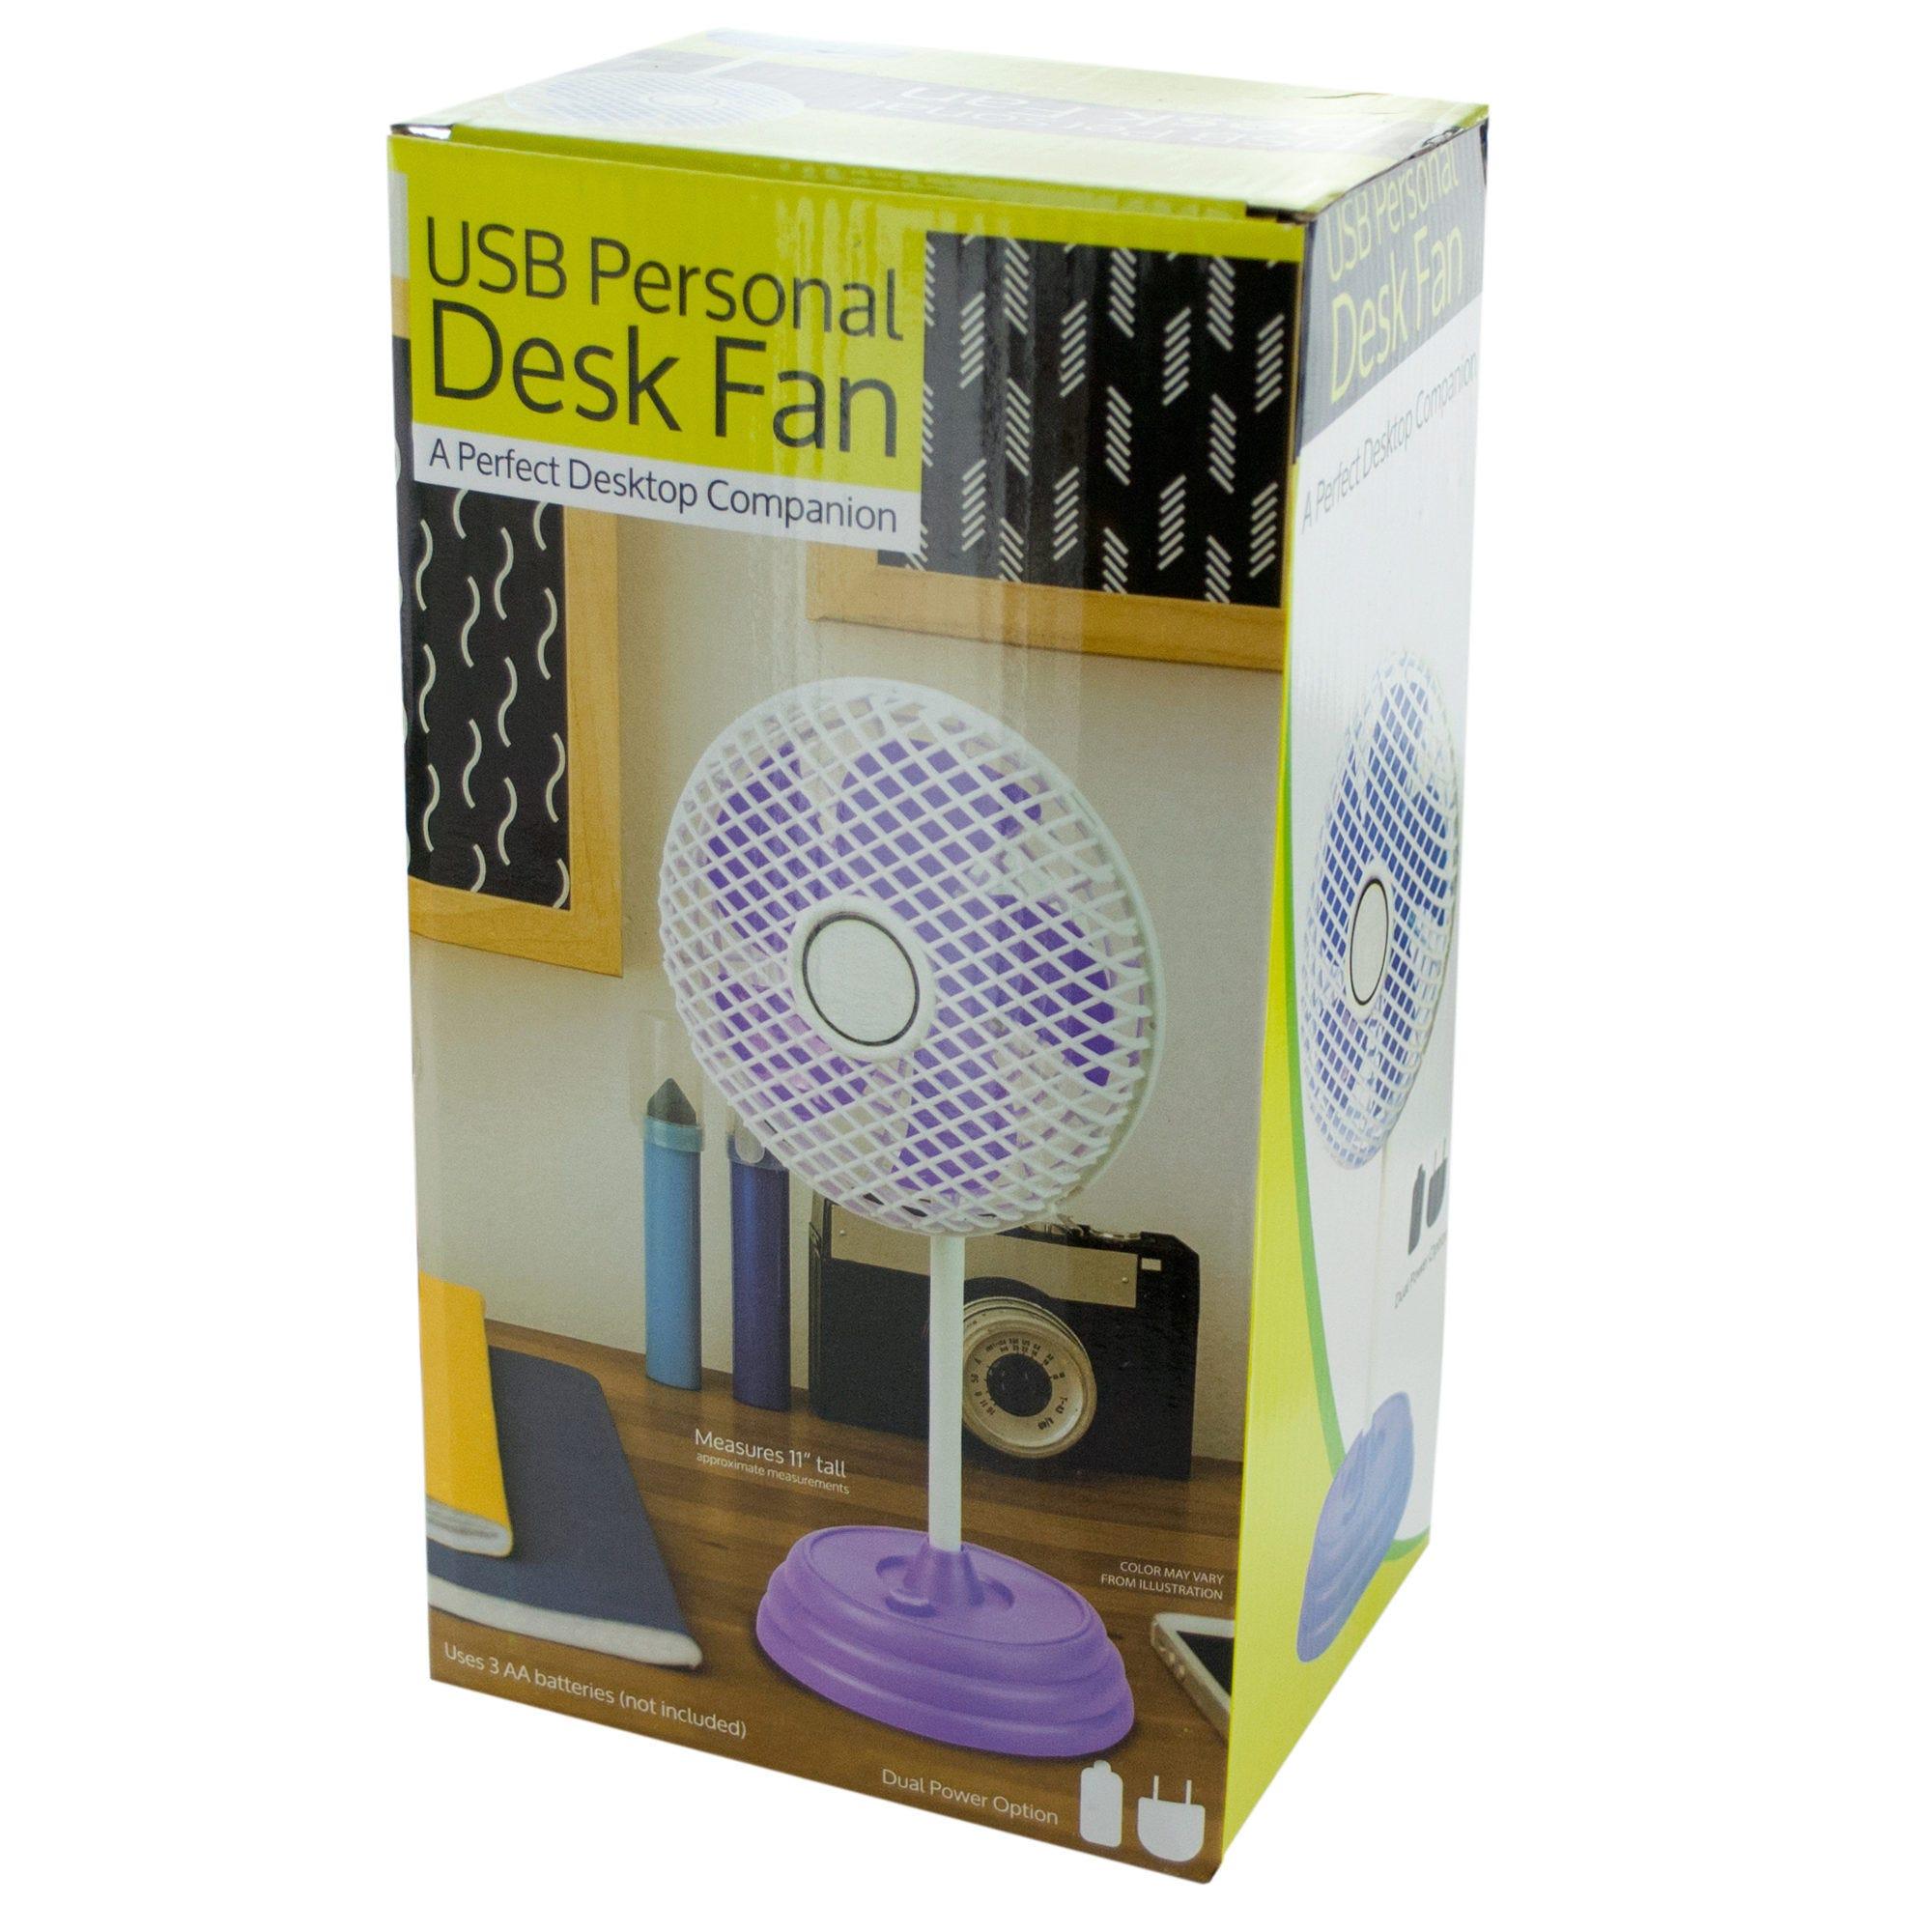 Classic Design USB Personal Desk Fan- Qty 4